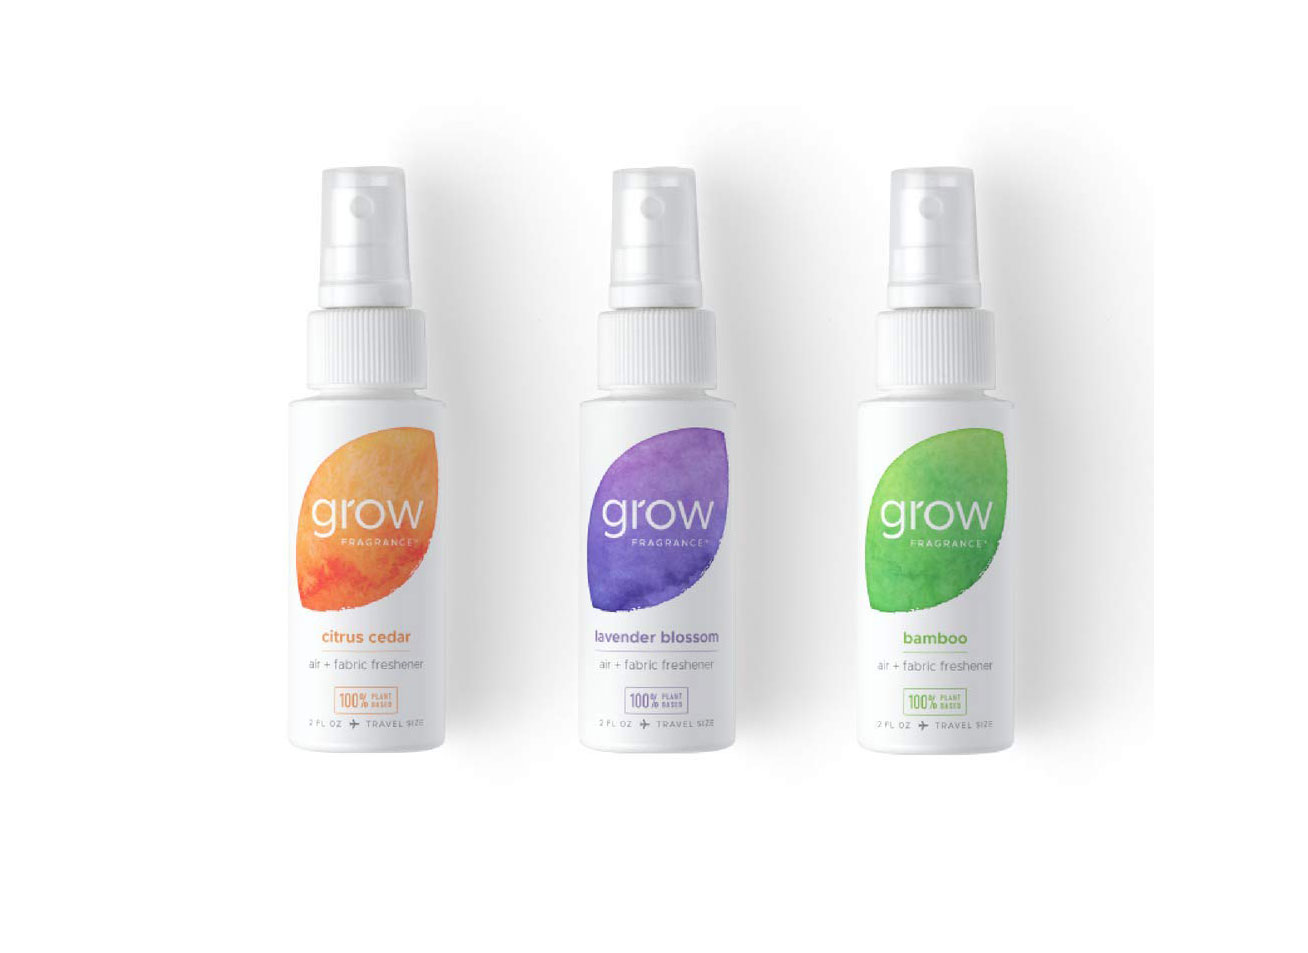 Grow Fragrance Plant-Based Fabric Freshener Travel Spray